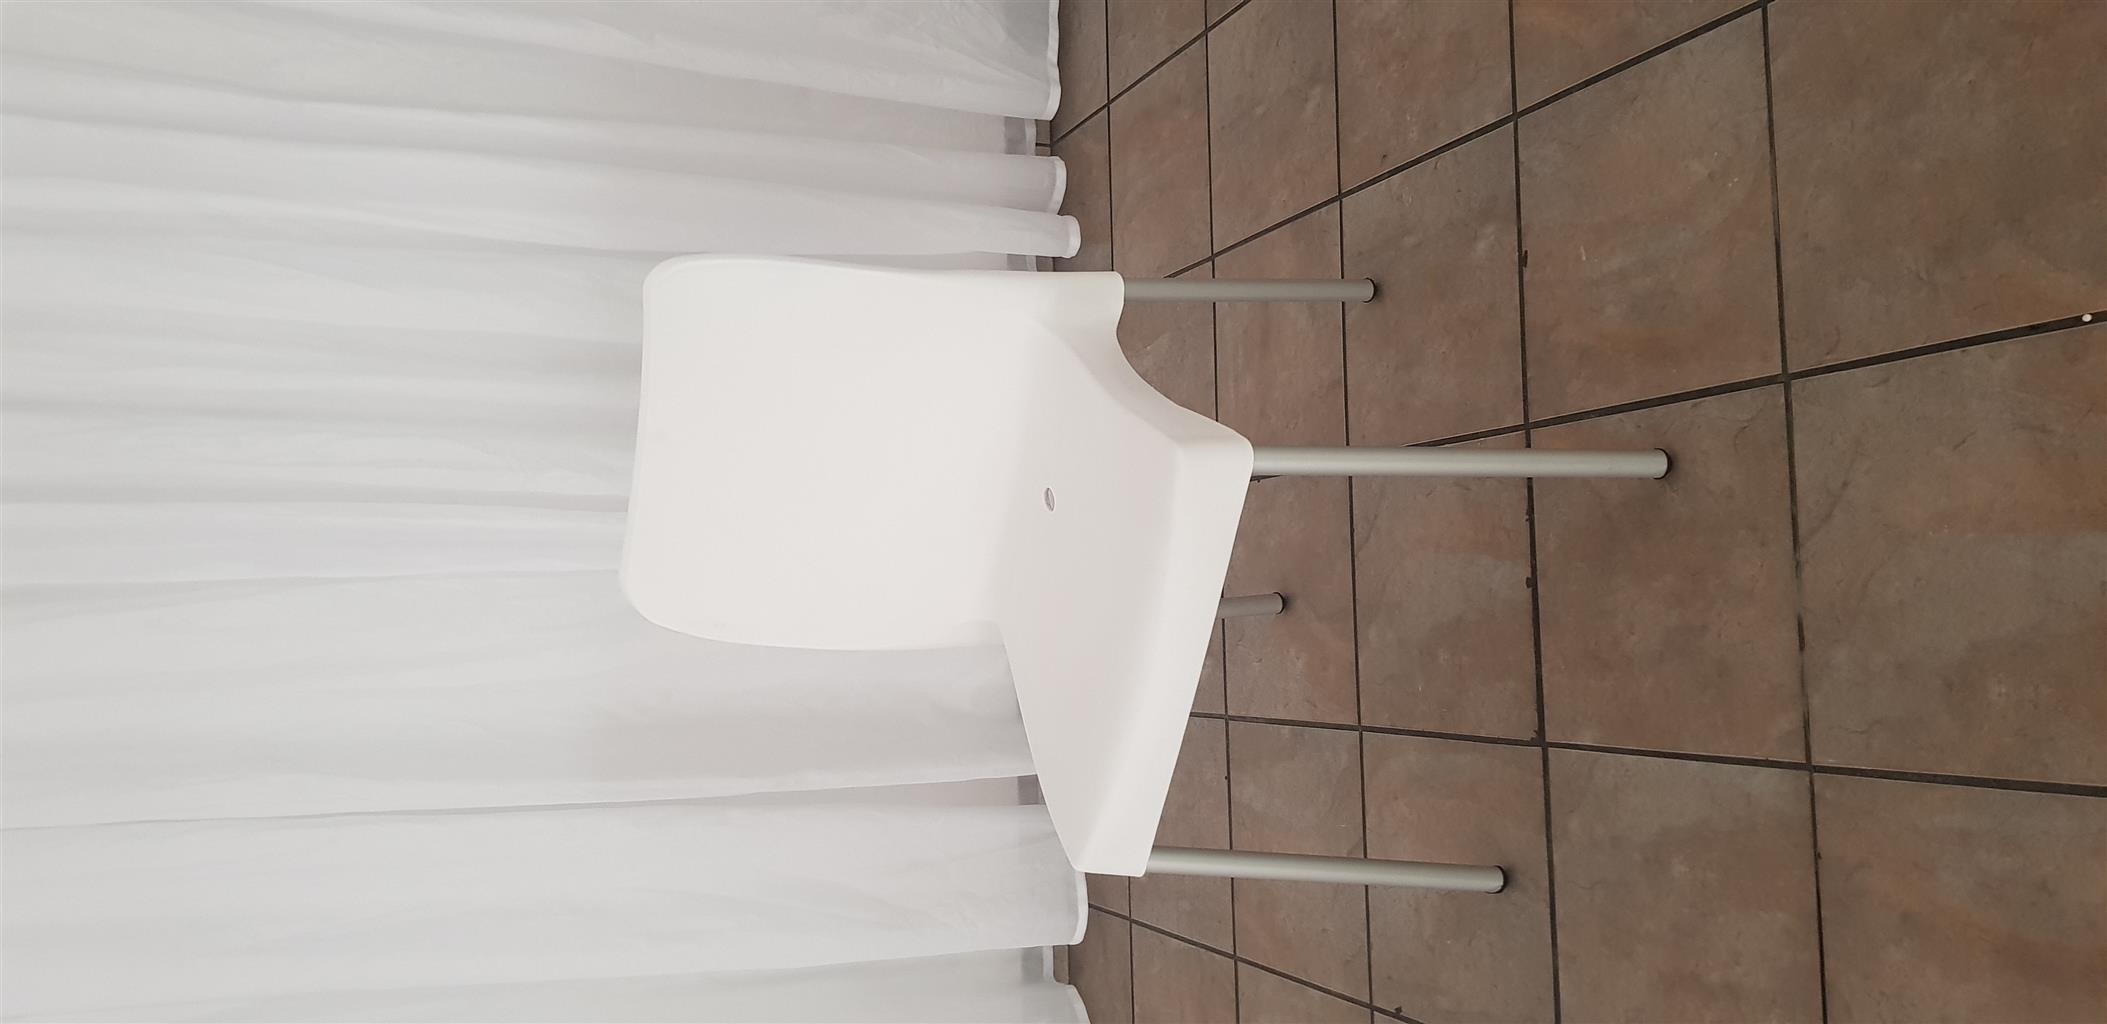 Plastic White Chairs